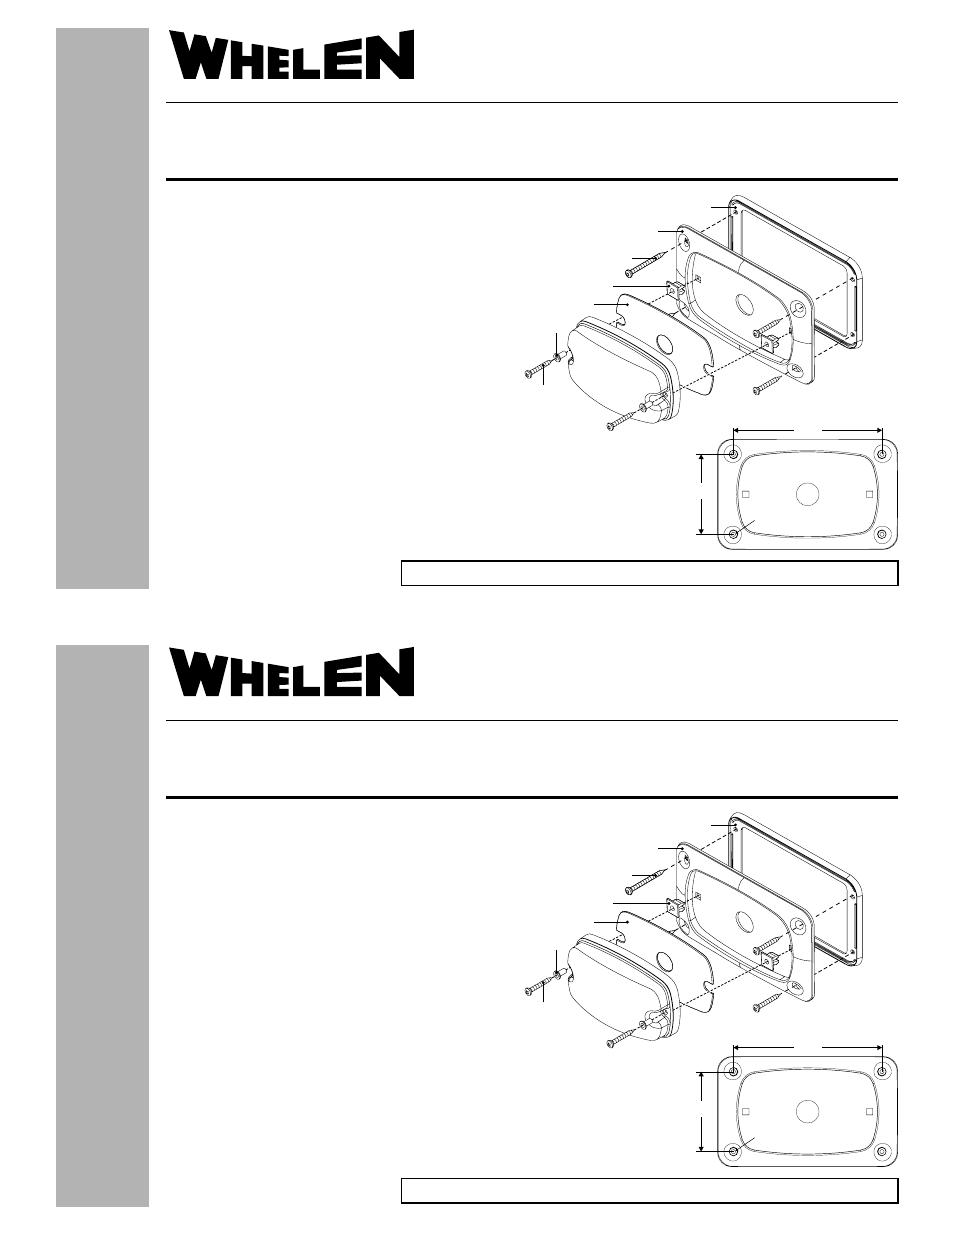 medium resolution of  whelen m6fc600 user manual 1 page on whelen lights whelen lightbar diagram